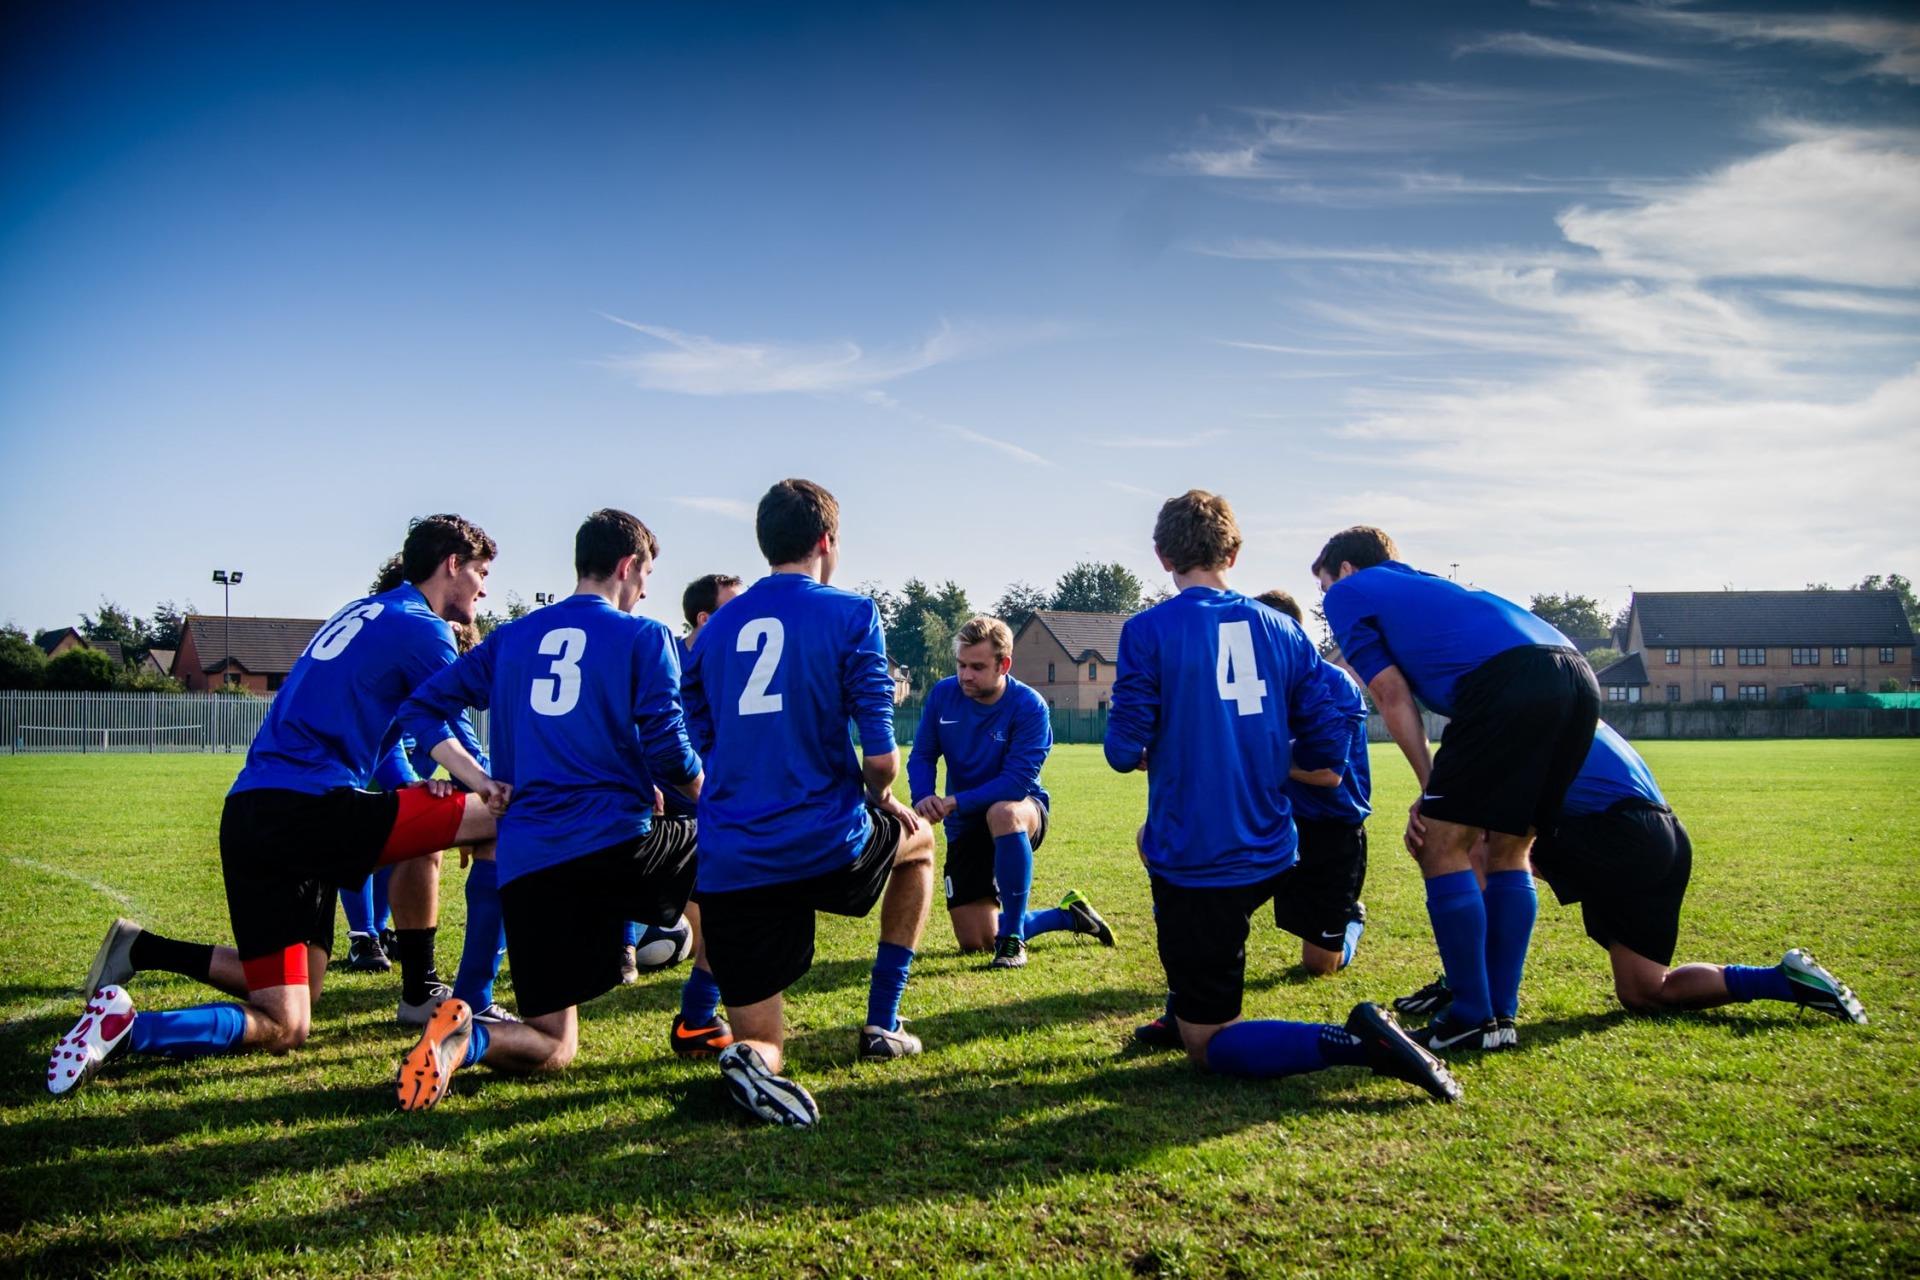 Soccer Training - For Improved Fitness and Better Skills